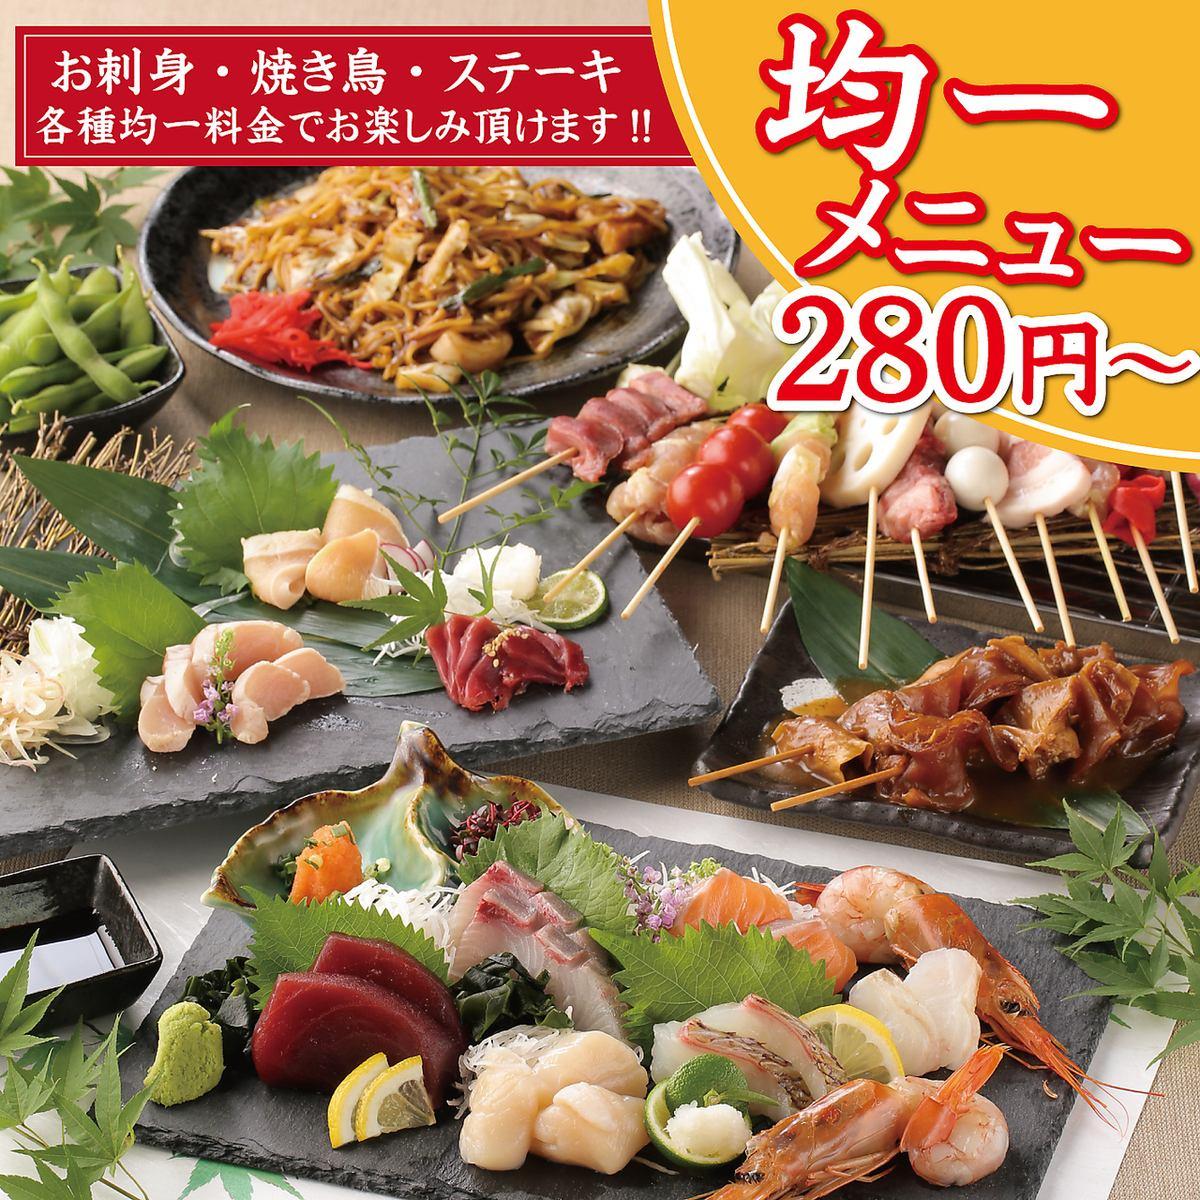 From izakaya menu to gem of commitment, offer at uniform price ♪ 280 yen ~